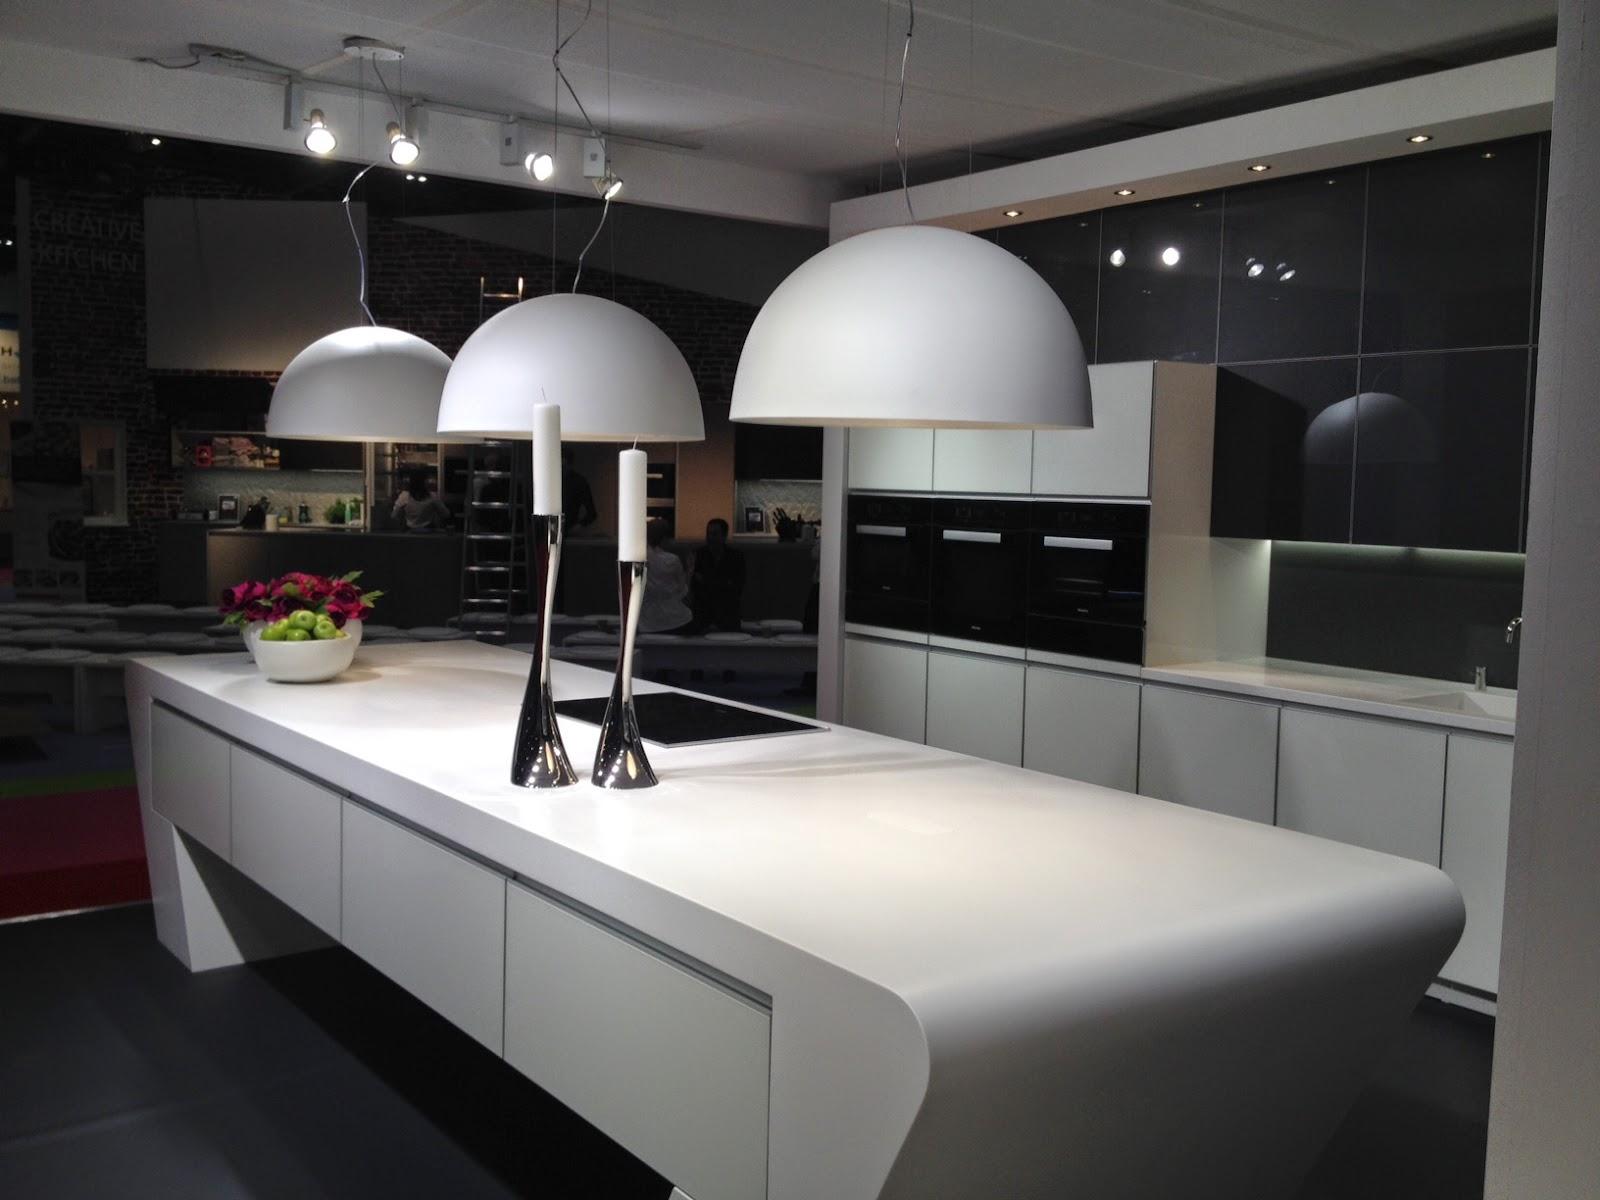 Client Kitchens: Grand Designs Live